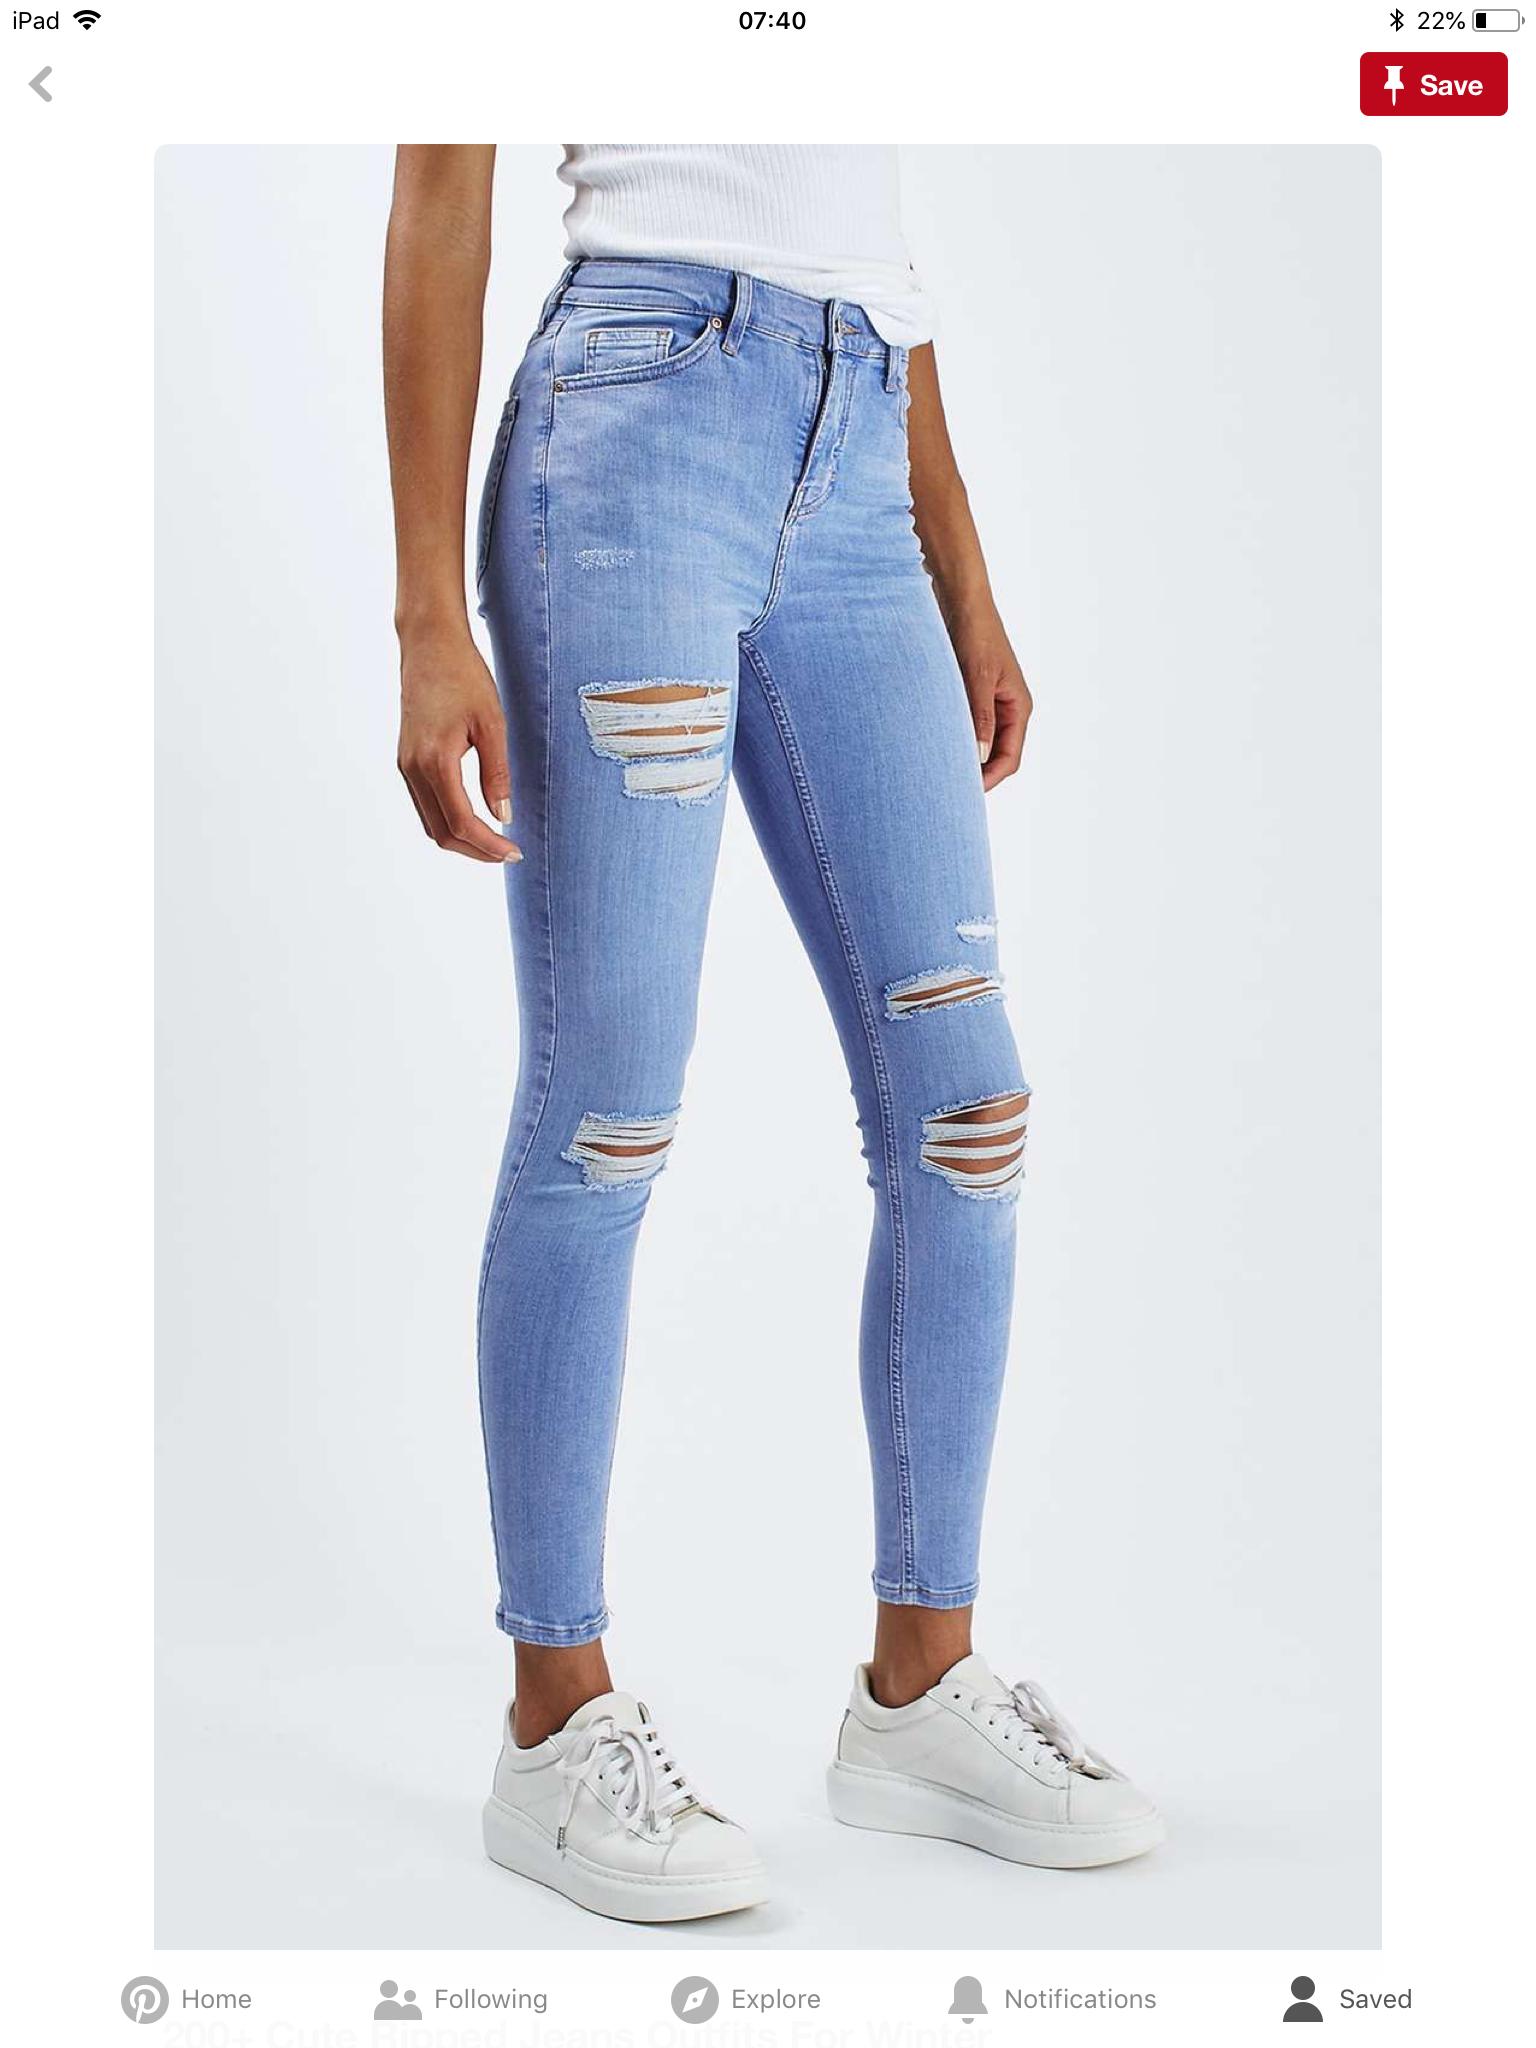 9c0ffefc3b1b Pin by Asiya on Rip jeans jeans